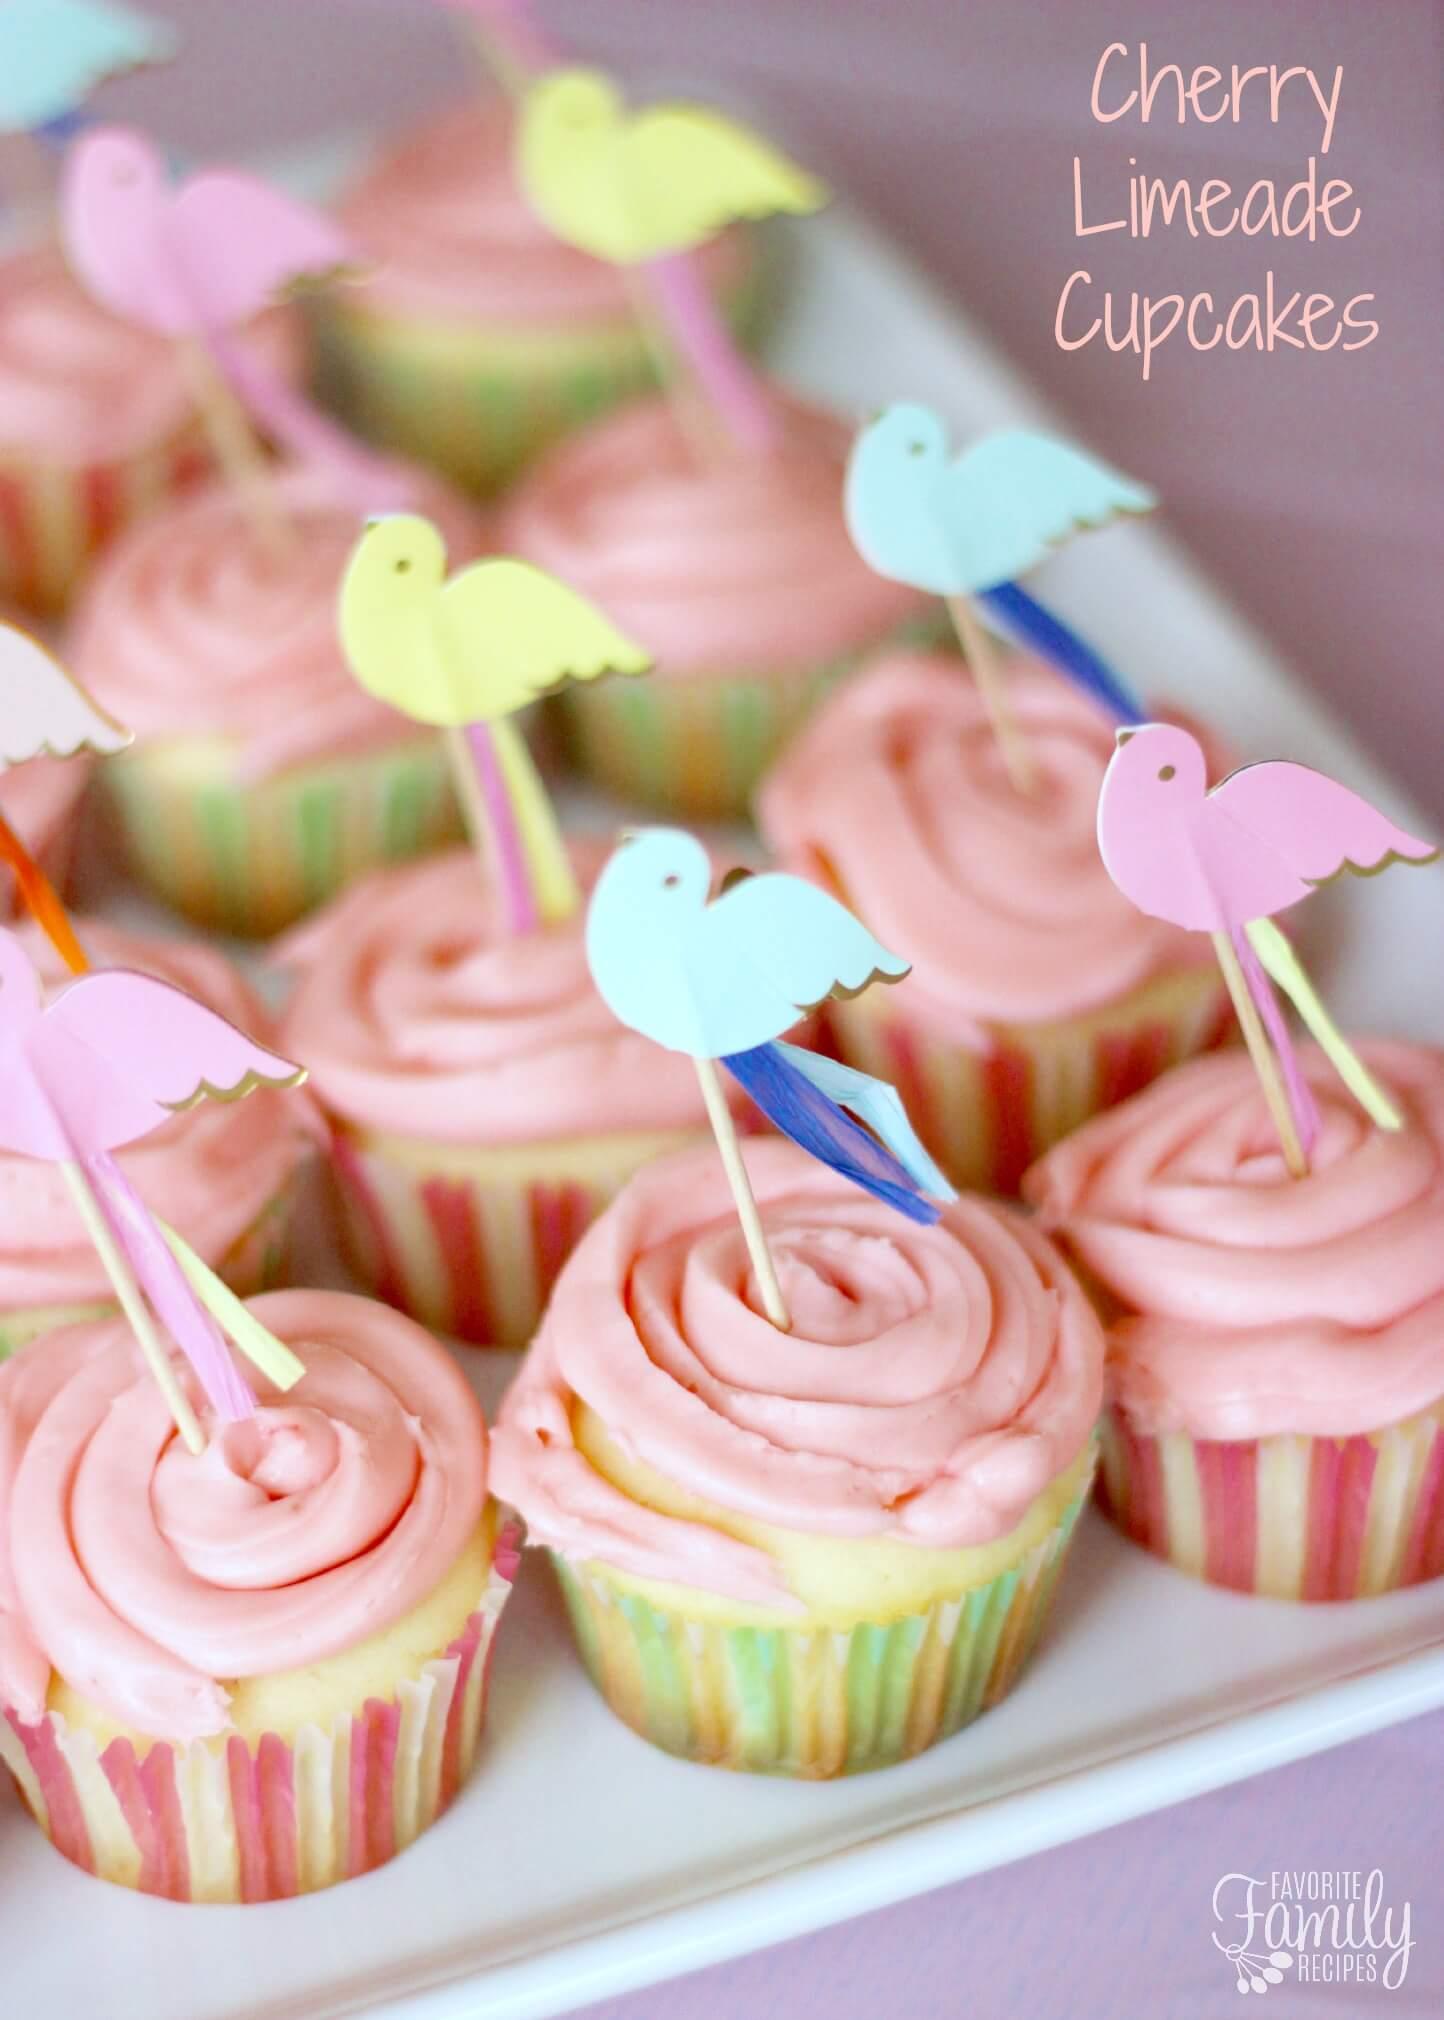 Cherry Limeade Cupcakes2